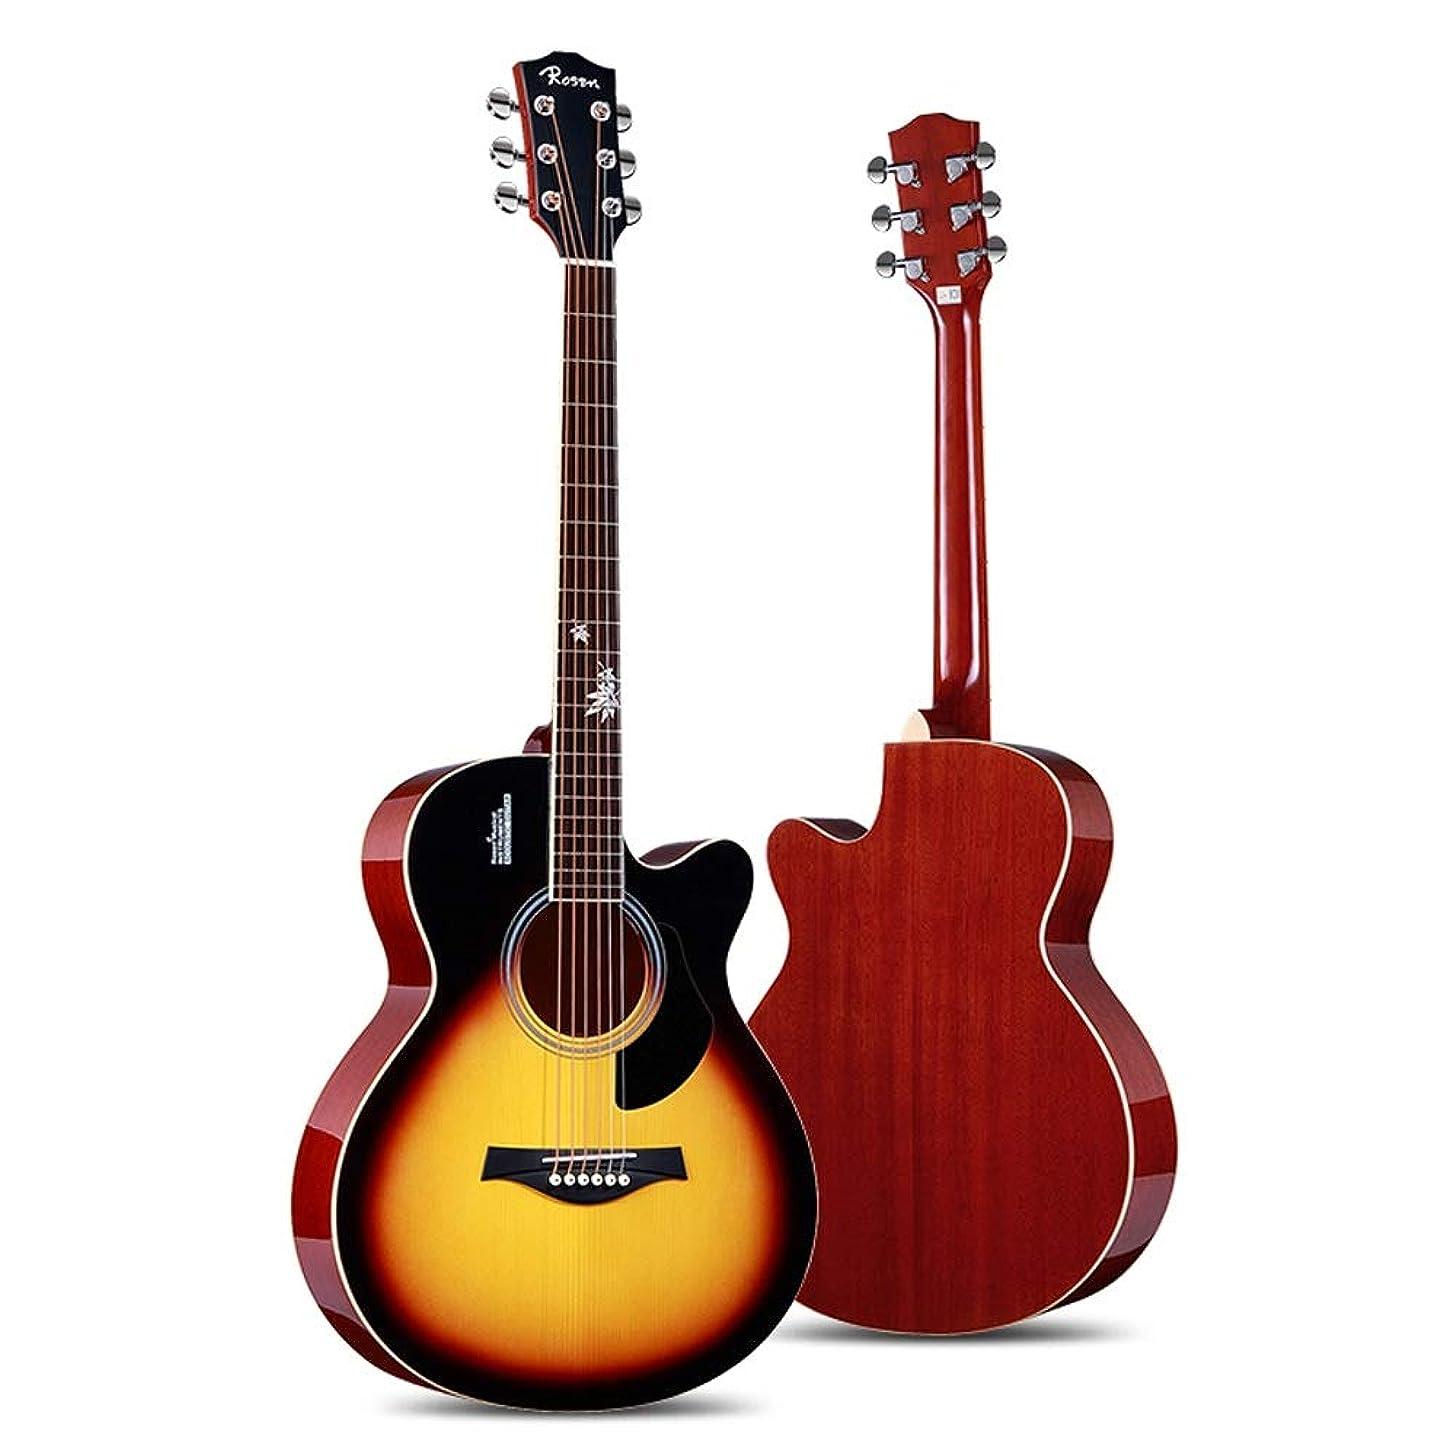 Miiliedy Minimalist Fashion Inlaid Maple Leaf Guitar 41 Inch Beginner Students Men Women Single Board Folk Acoustic Guitar with Strings Picks Tuner Capo Polishing Cloth